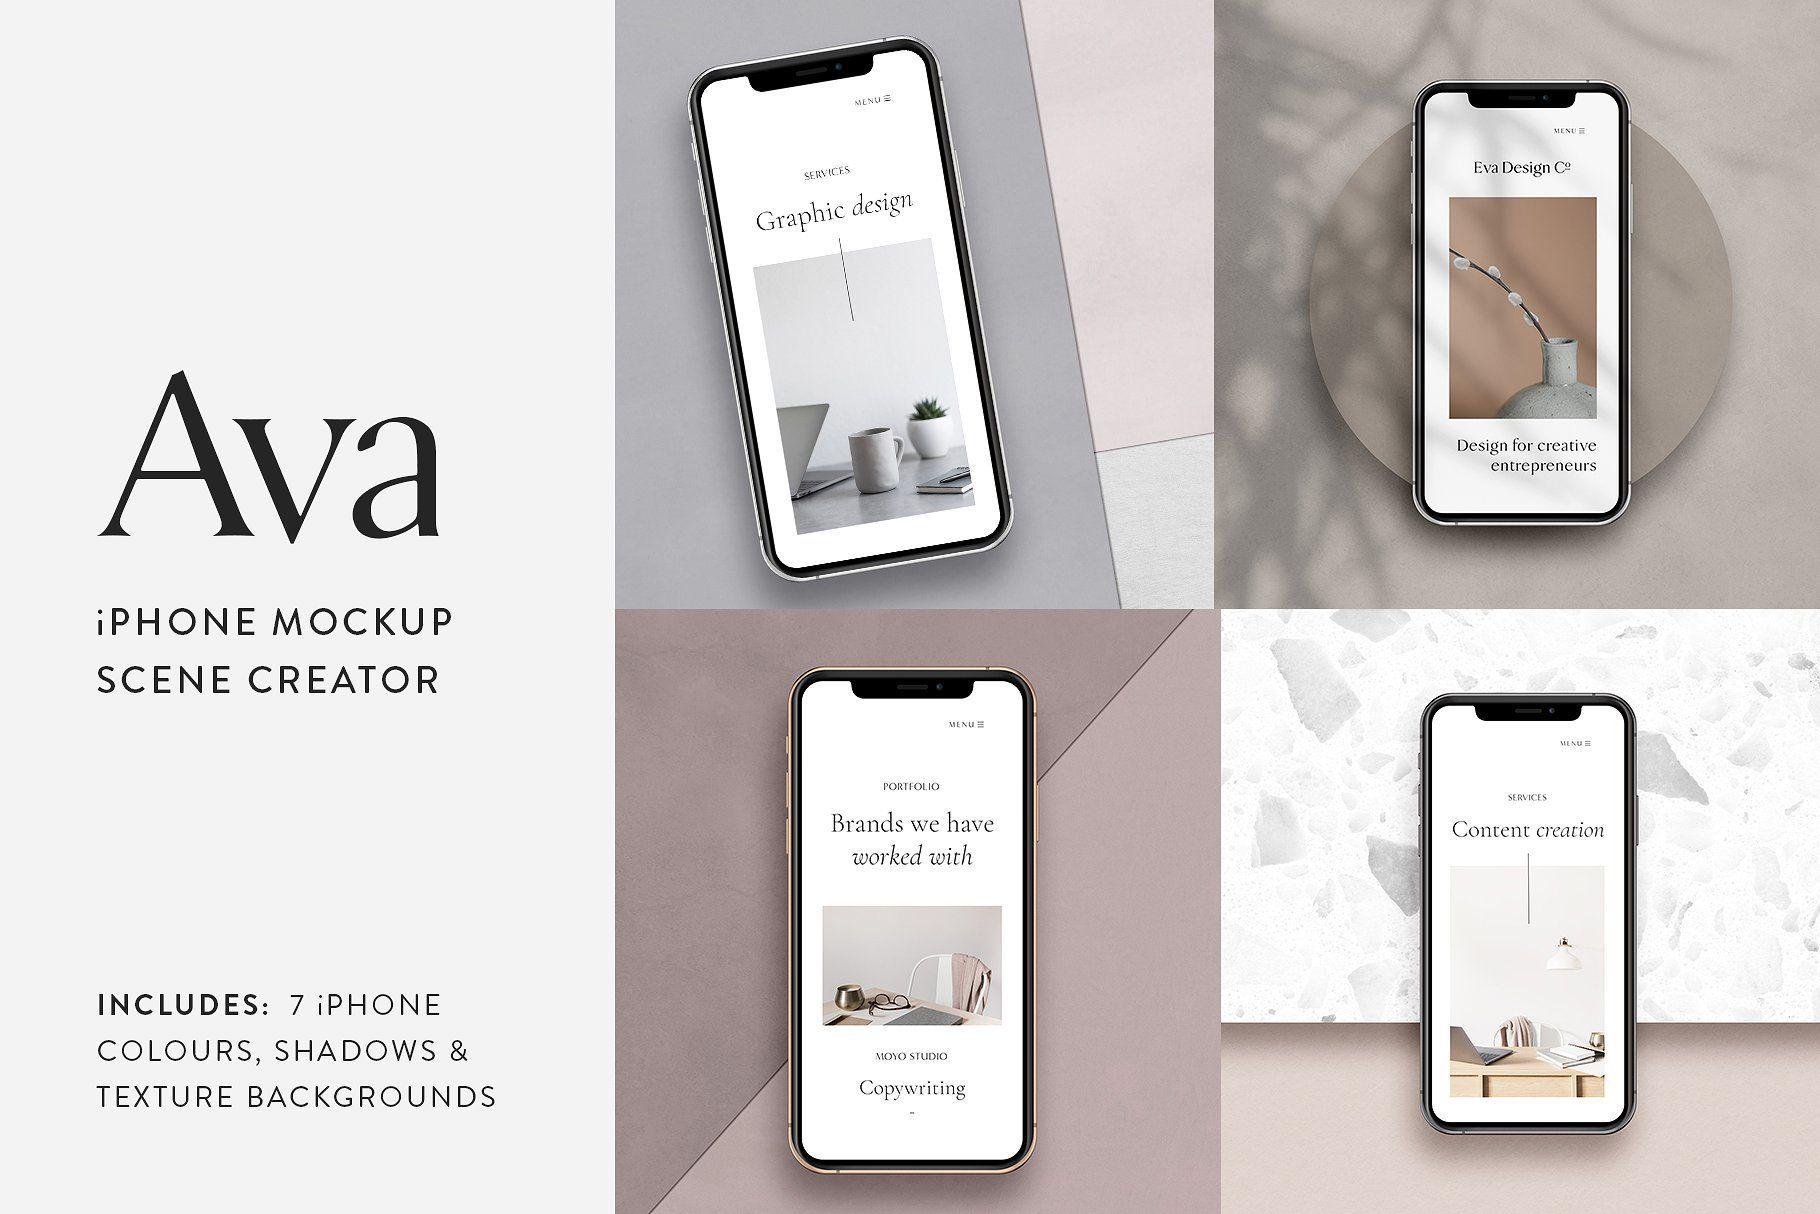 Download Ava Iphone Mockup Scene Creator Iphone Mockup Scene Creator Iphone Colors